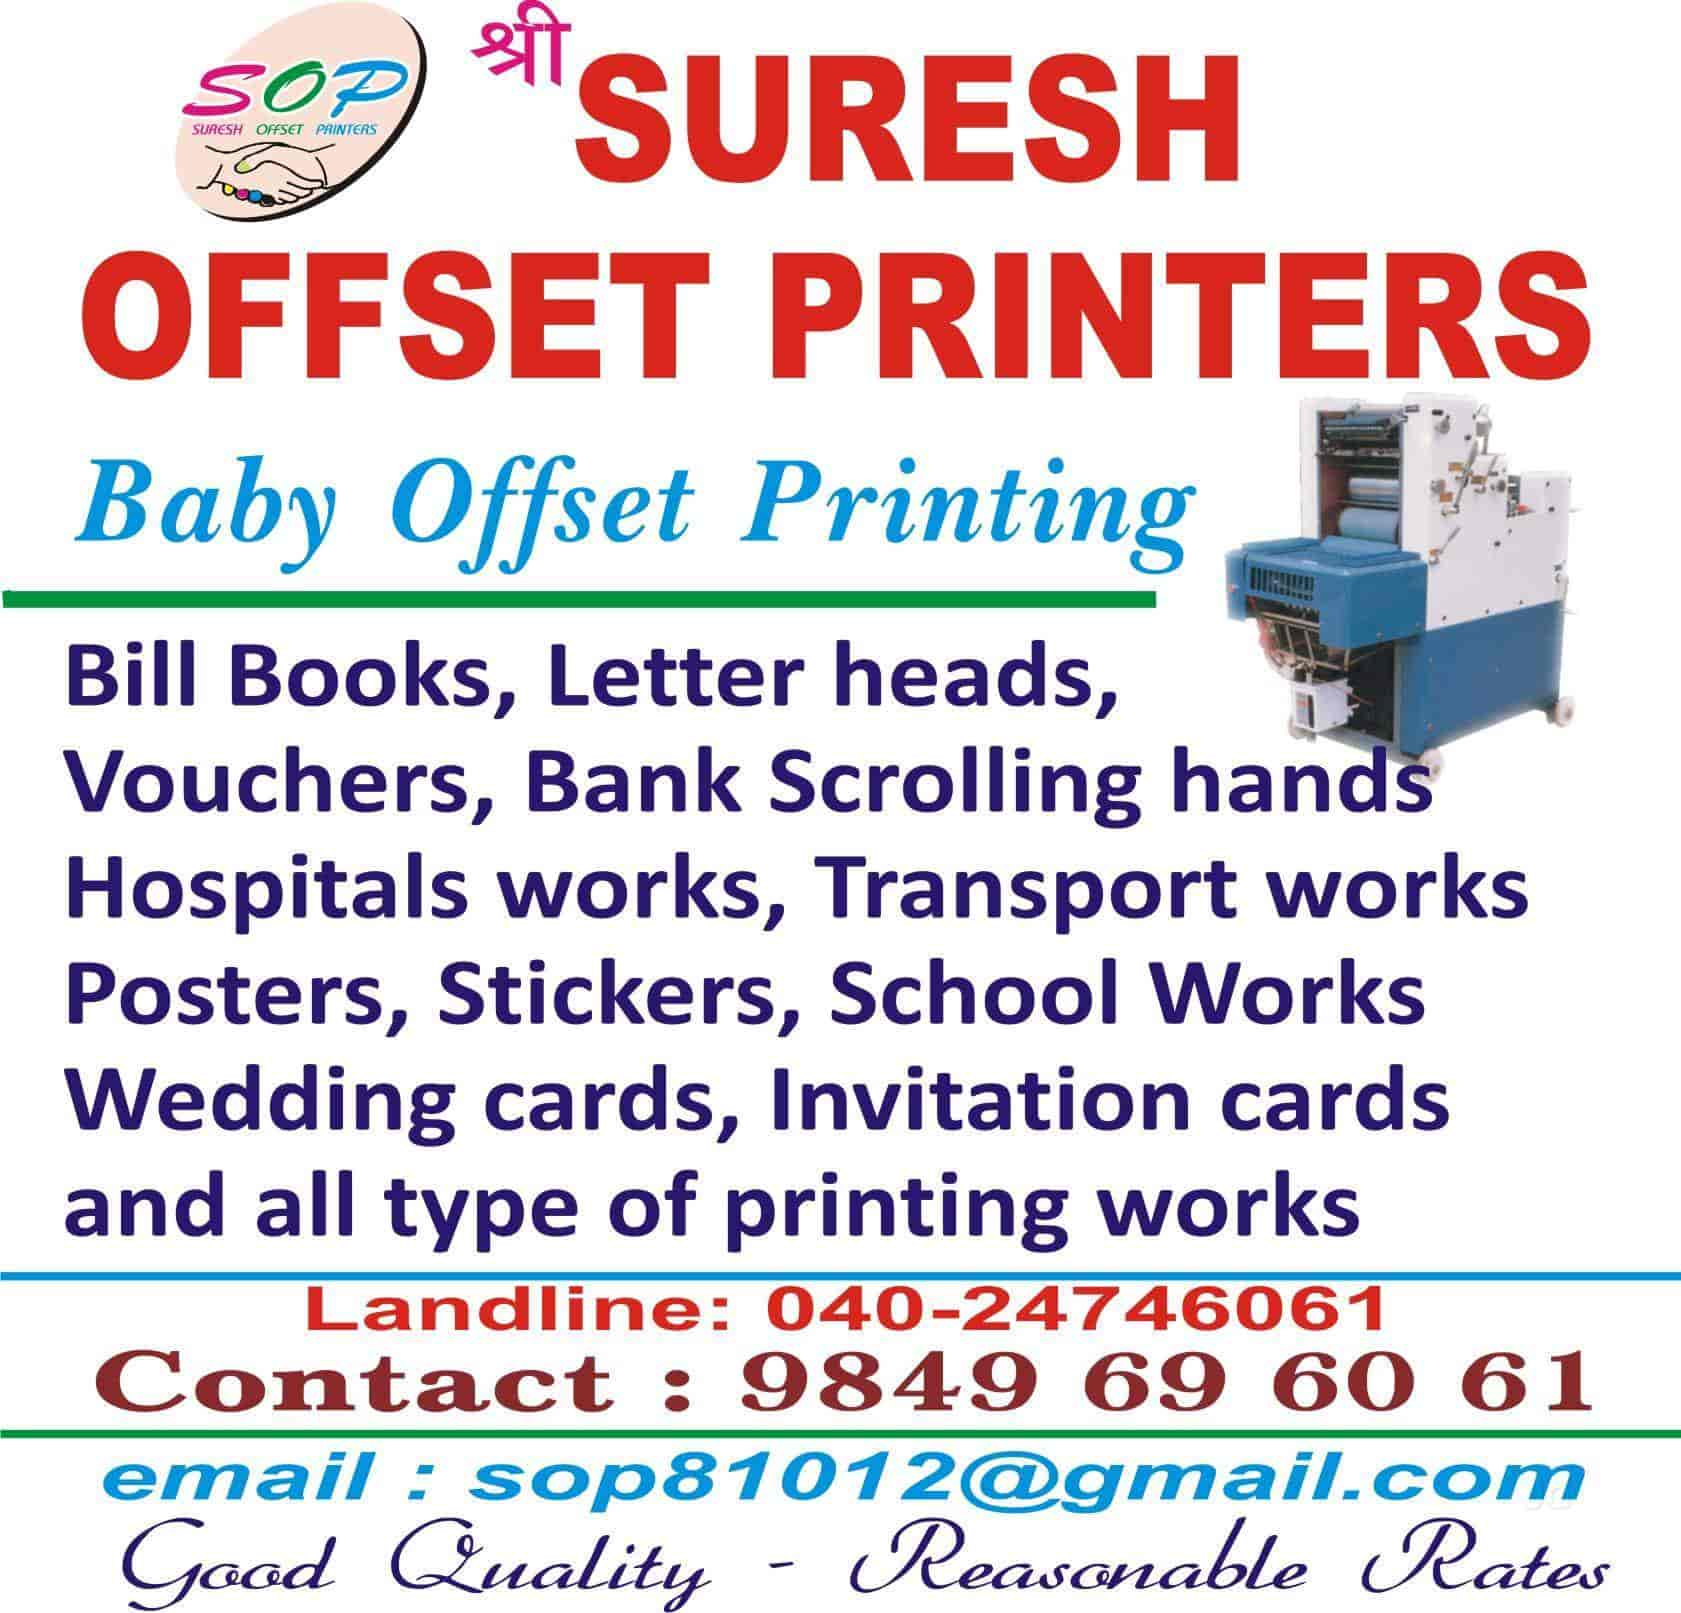 Suresh offset printers photos kachiguda hyderabad pictures suresh offset printers photos kachiguda hyderabad pictures images gallery justdial stopboris Choice Image